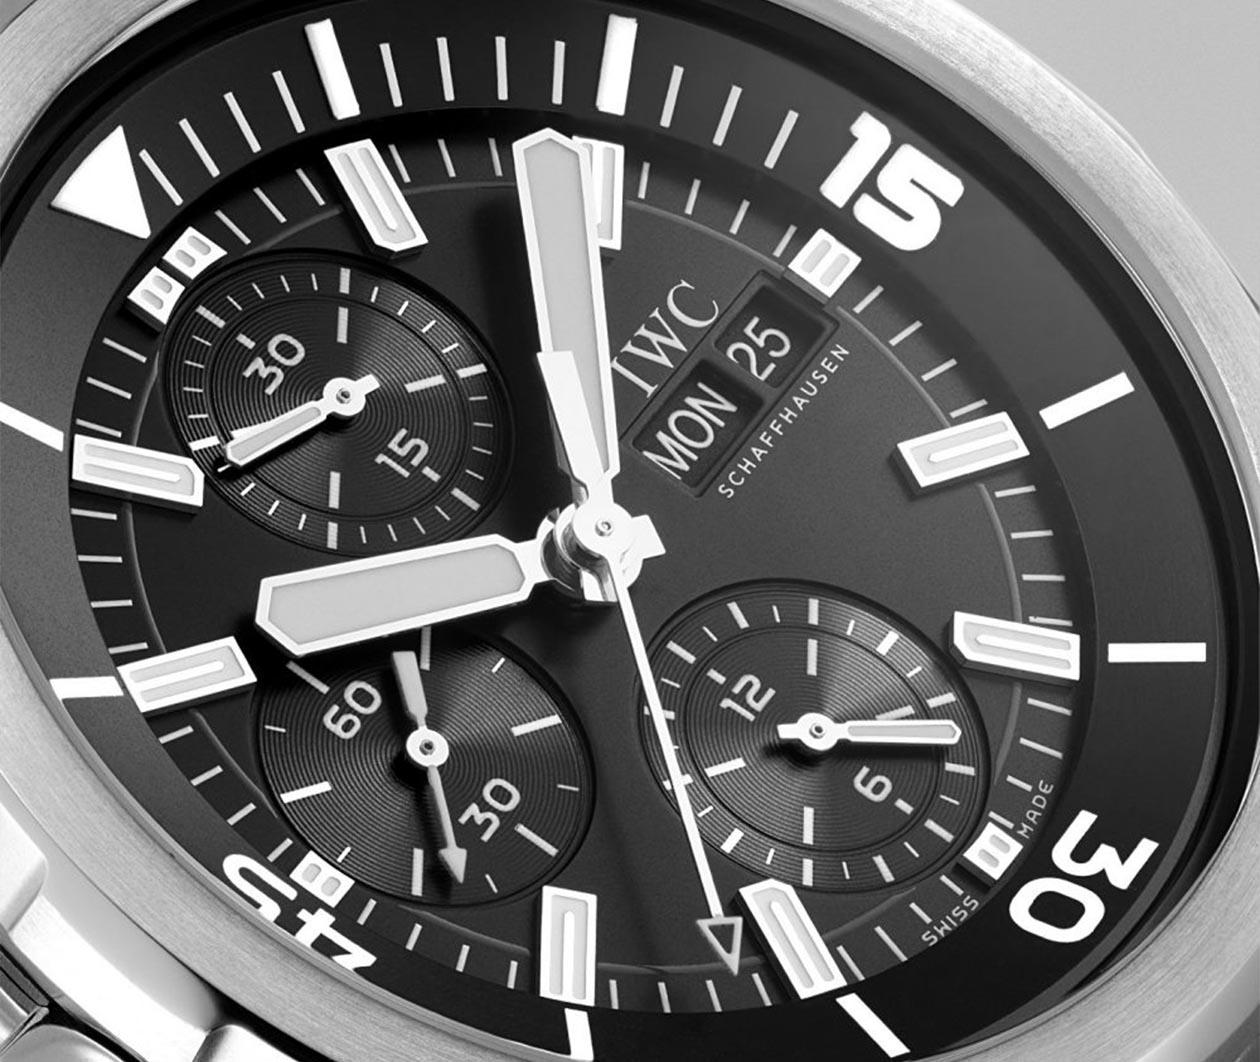 IWC Aquatimer Chronograph IW376804 Carousel 4 FINAL